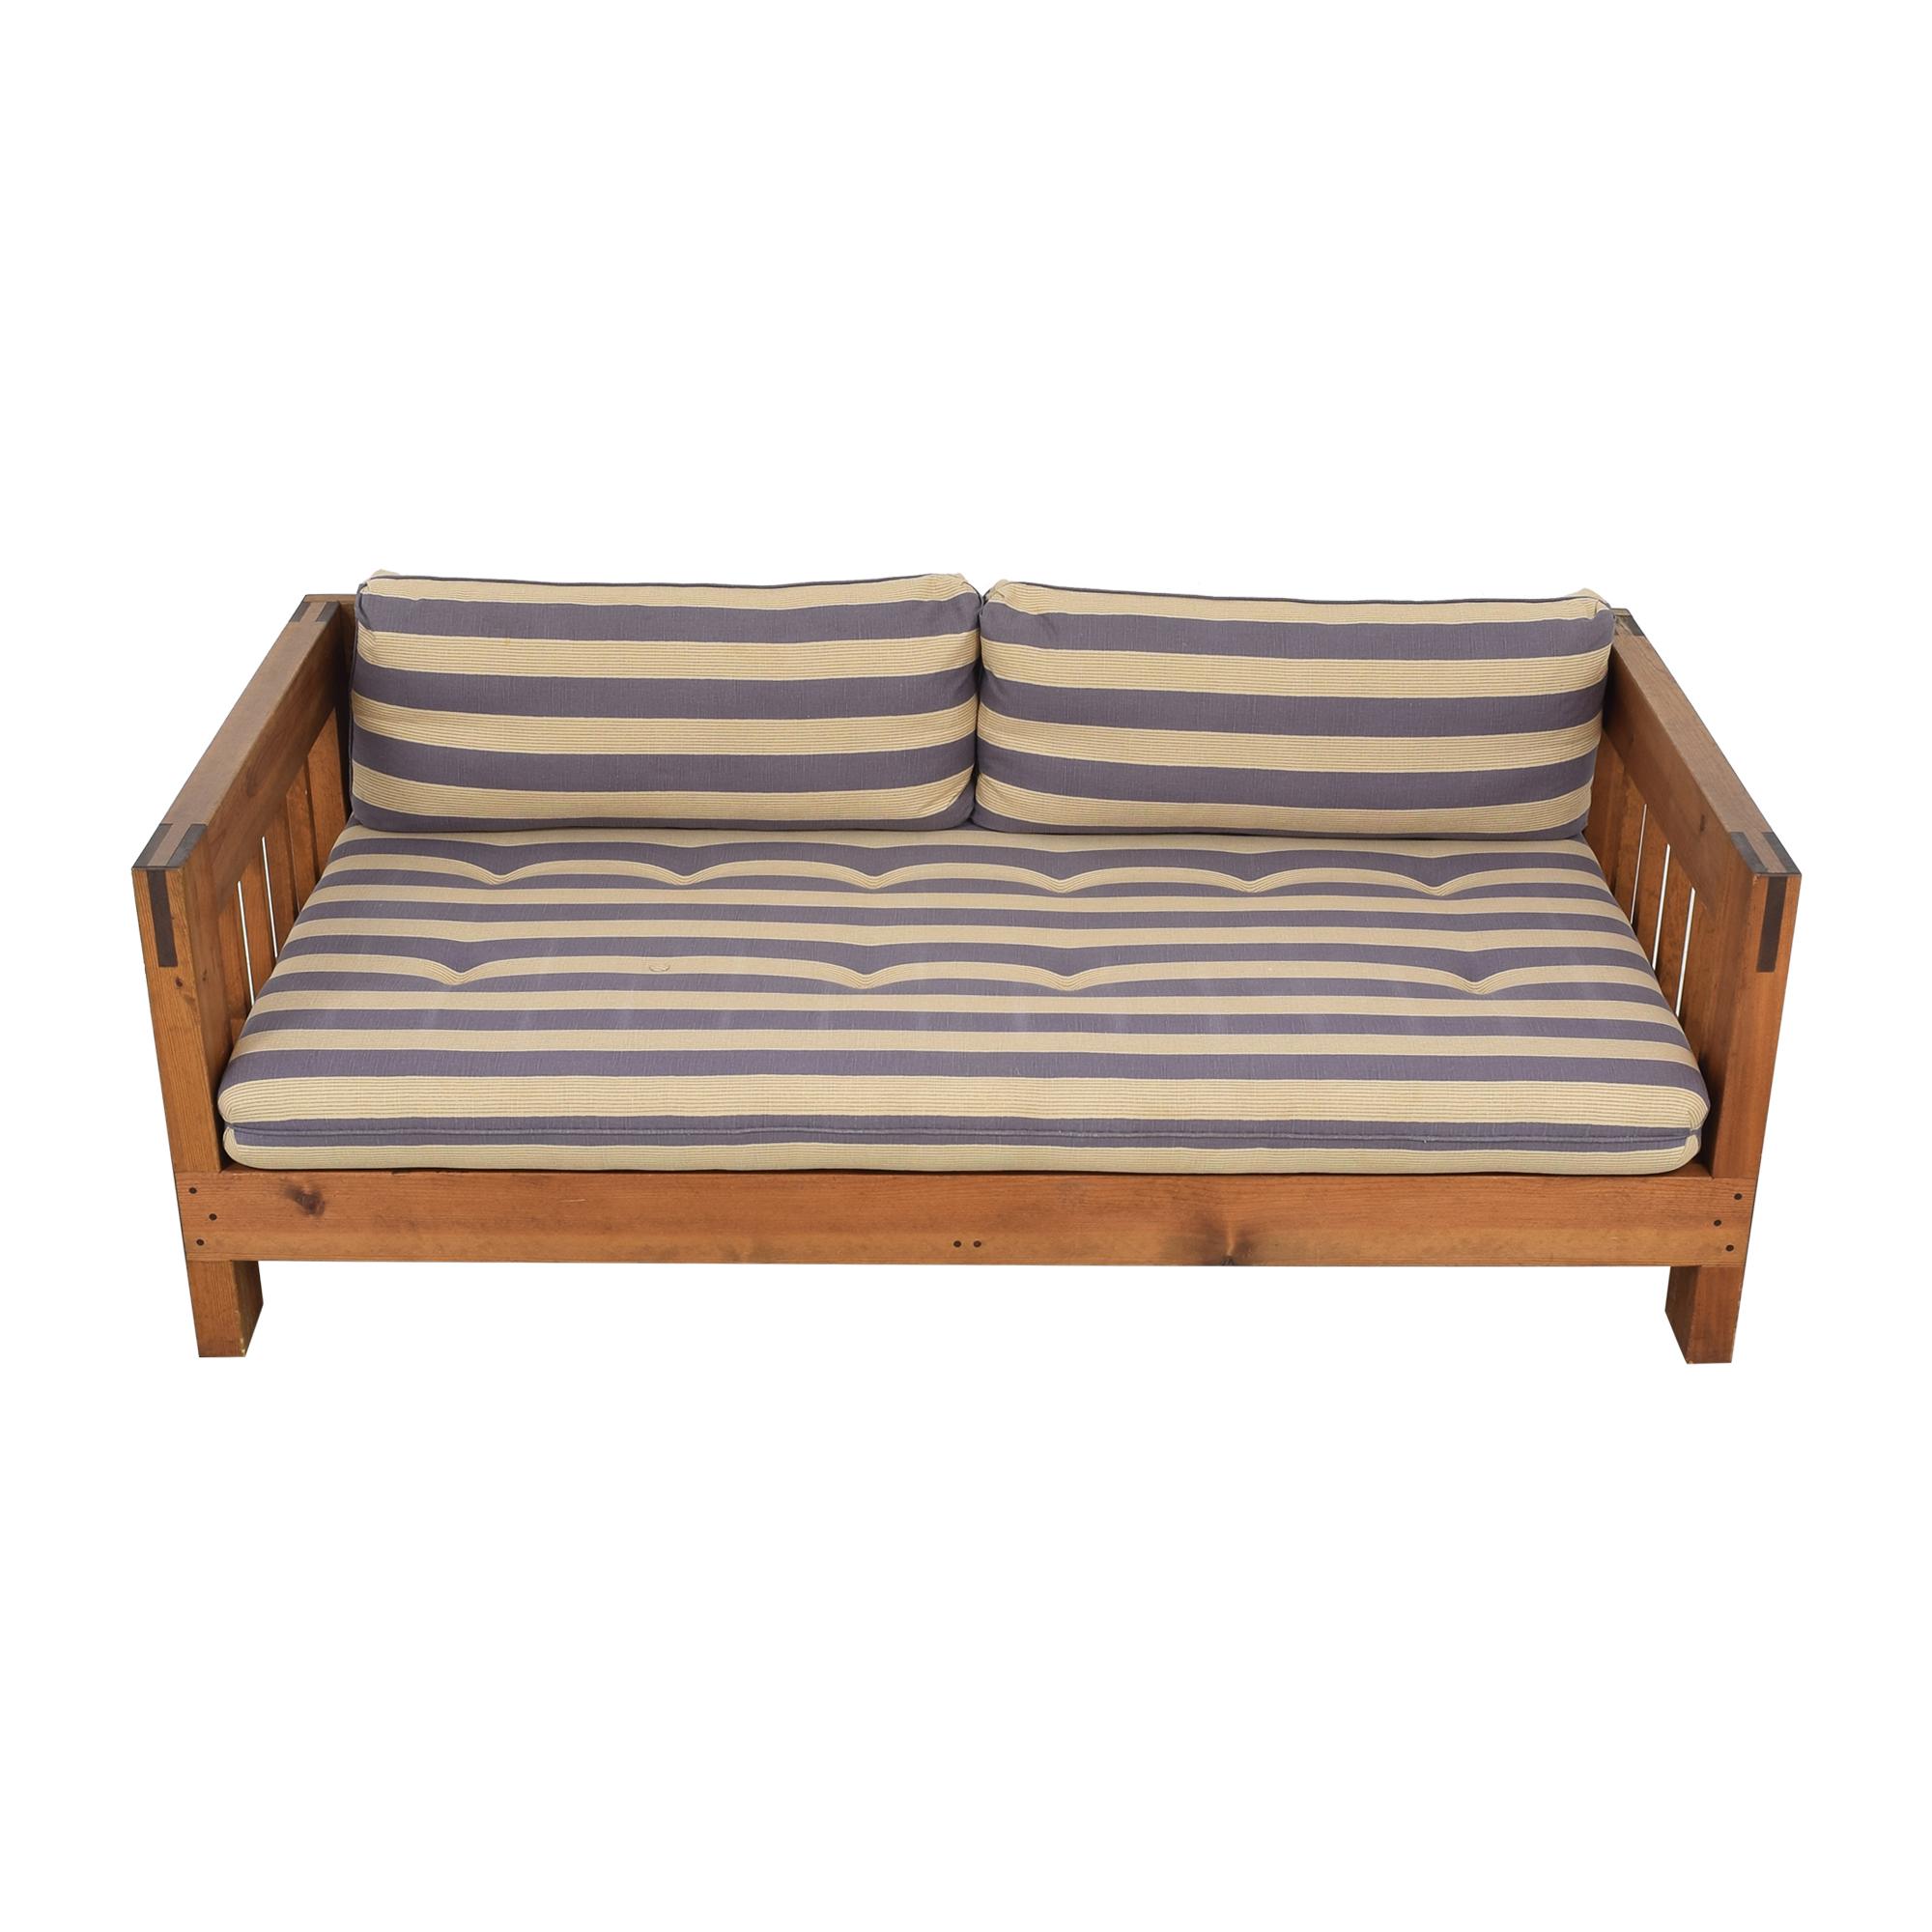 Taos Furniture Toas Furniture Galisteo Sofa